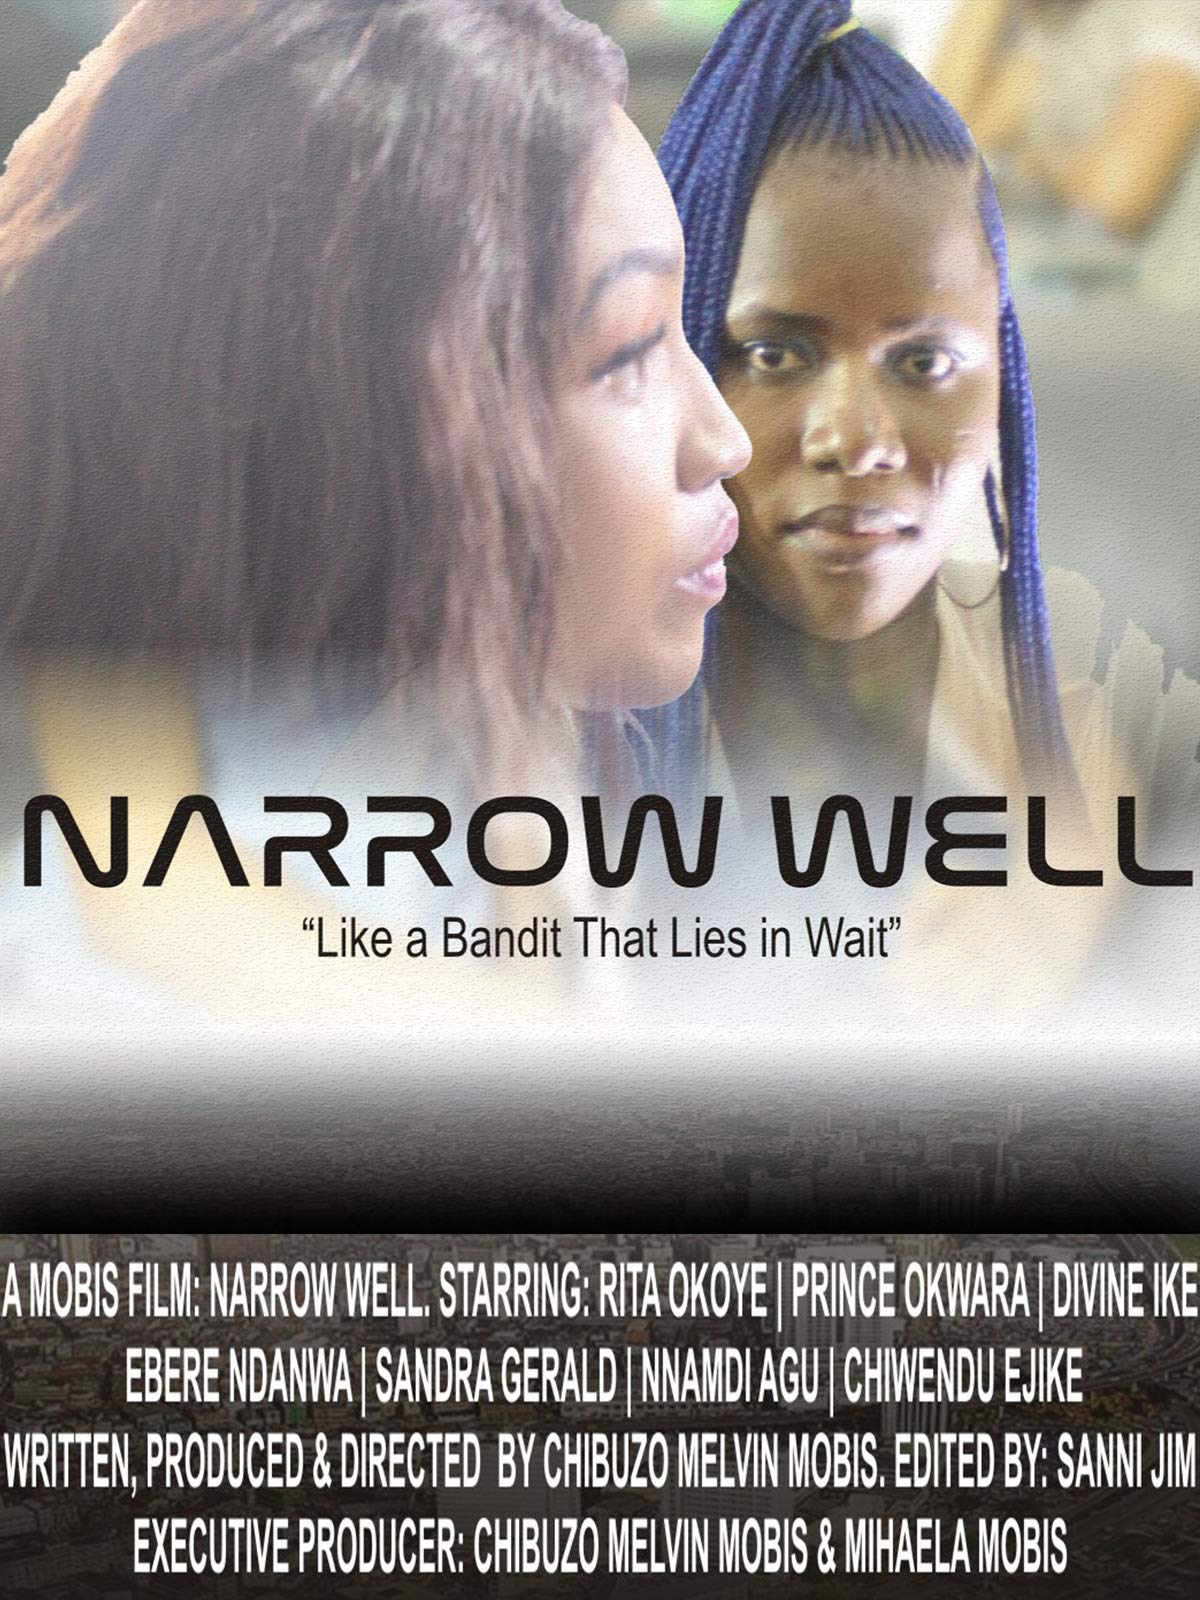 Narrow Well